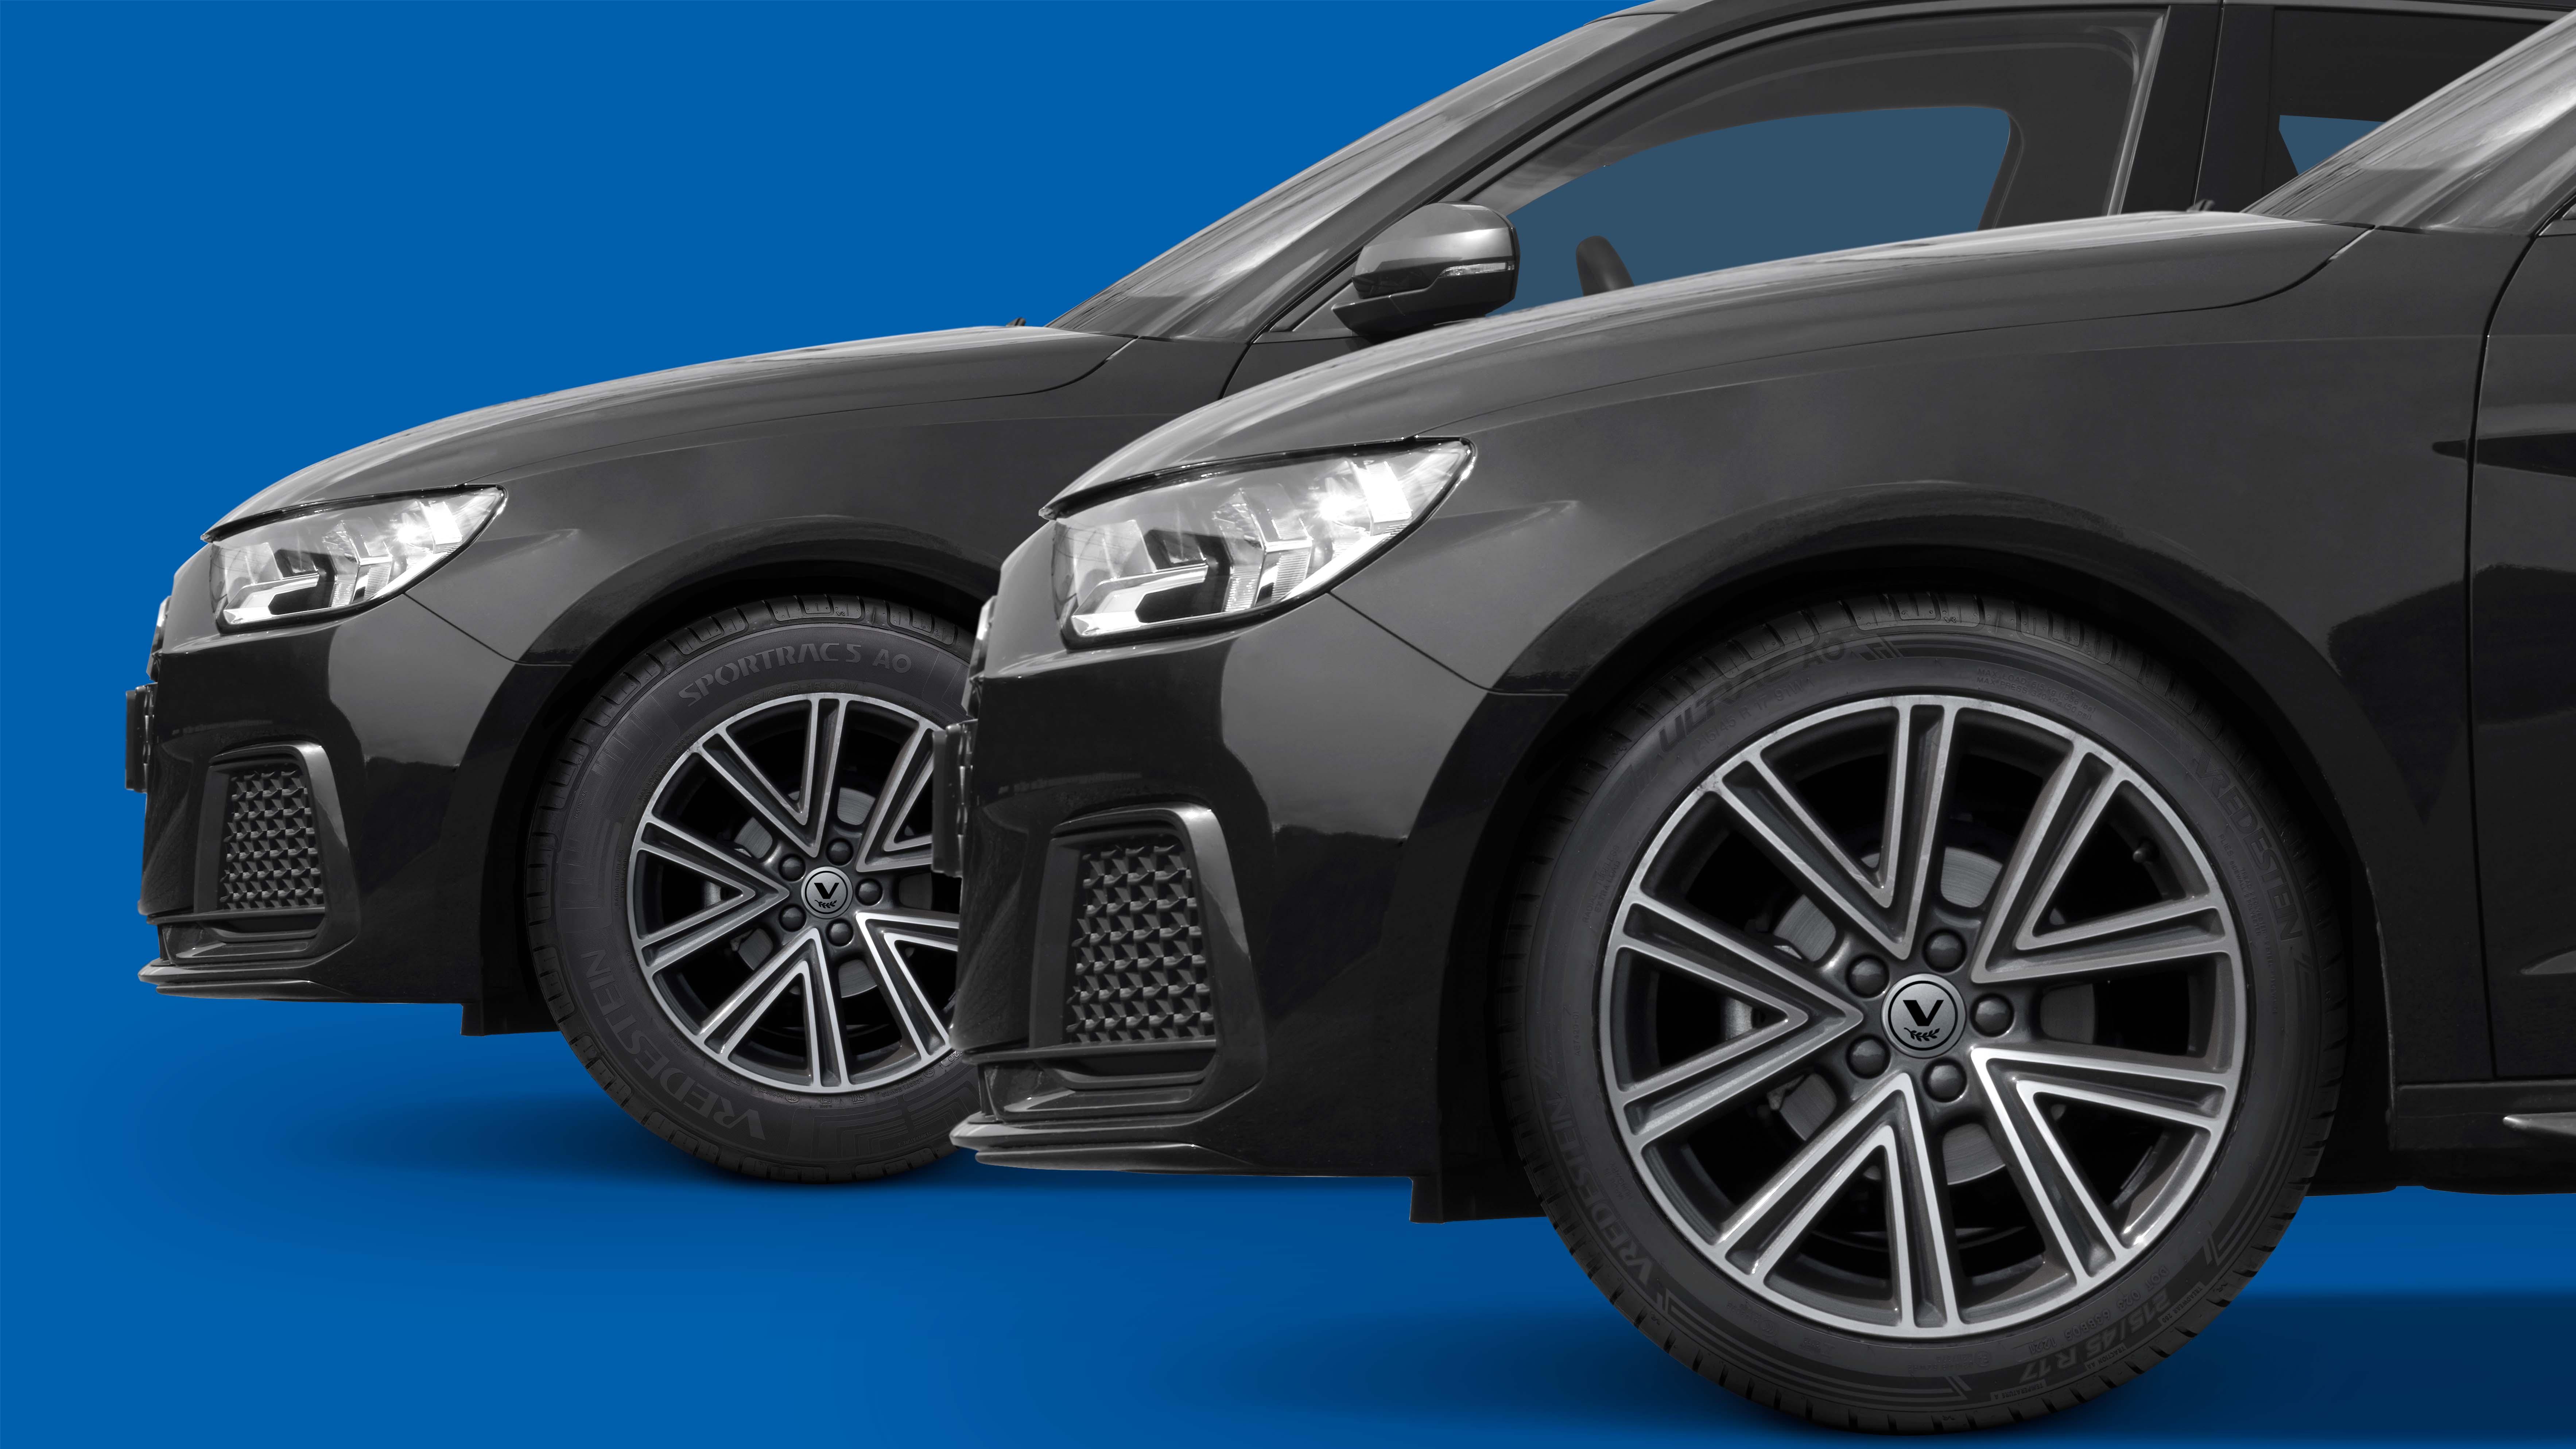 Vredestein summer tyres chosen as standard fitment for Audi A1 Sportback